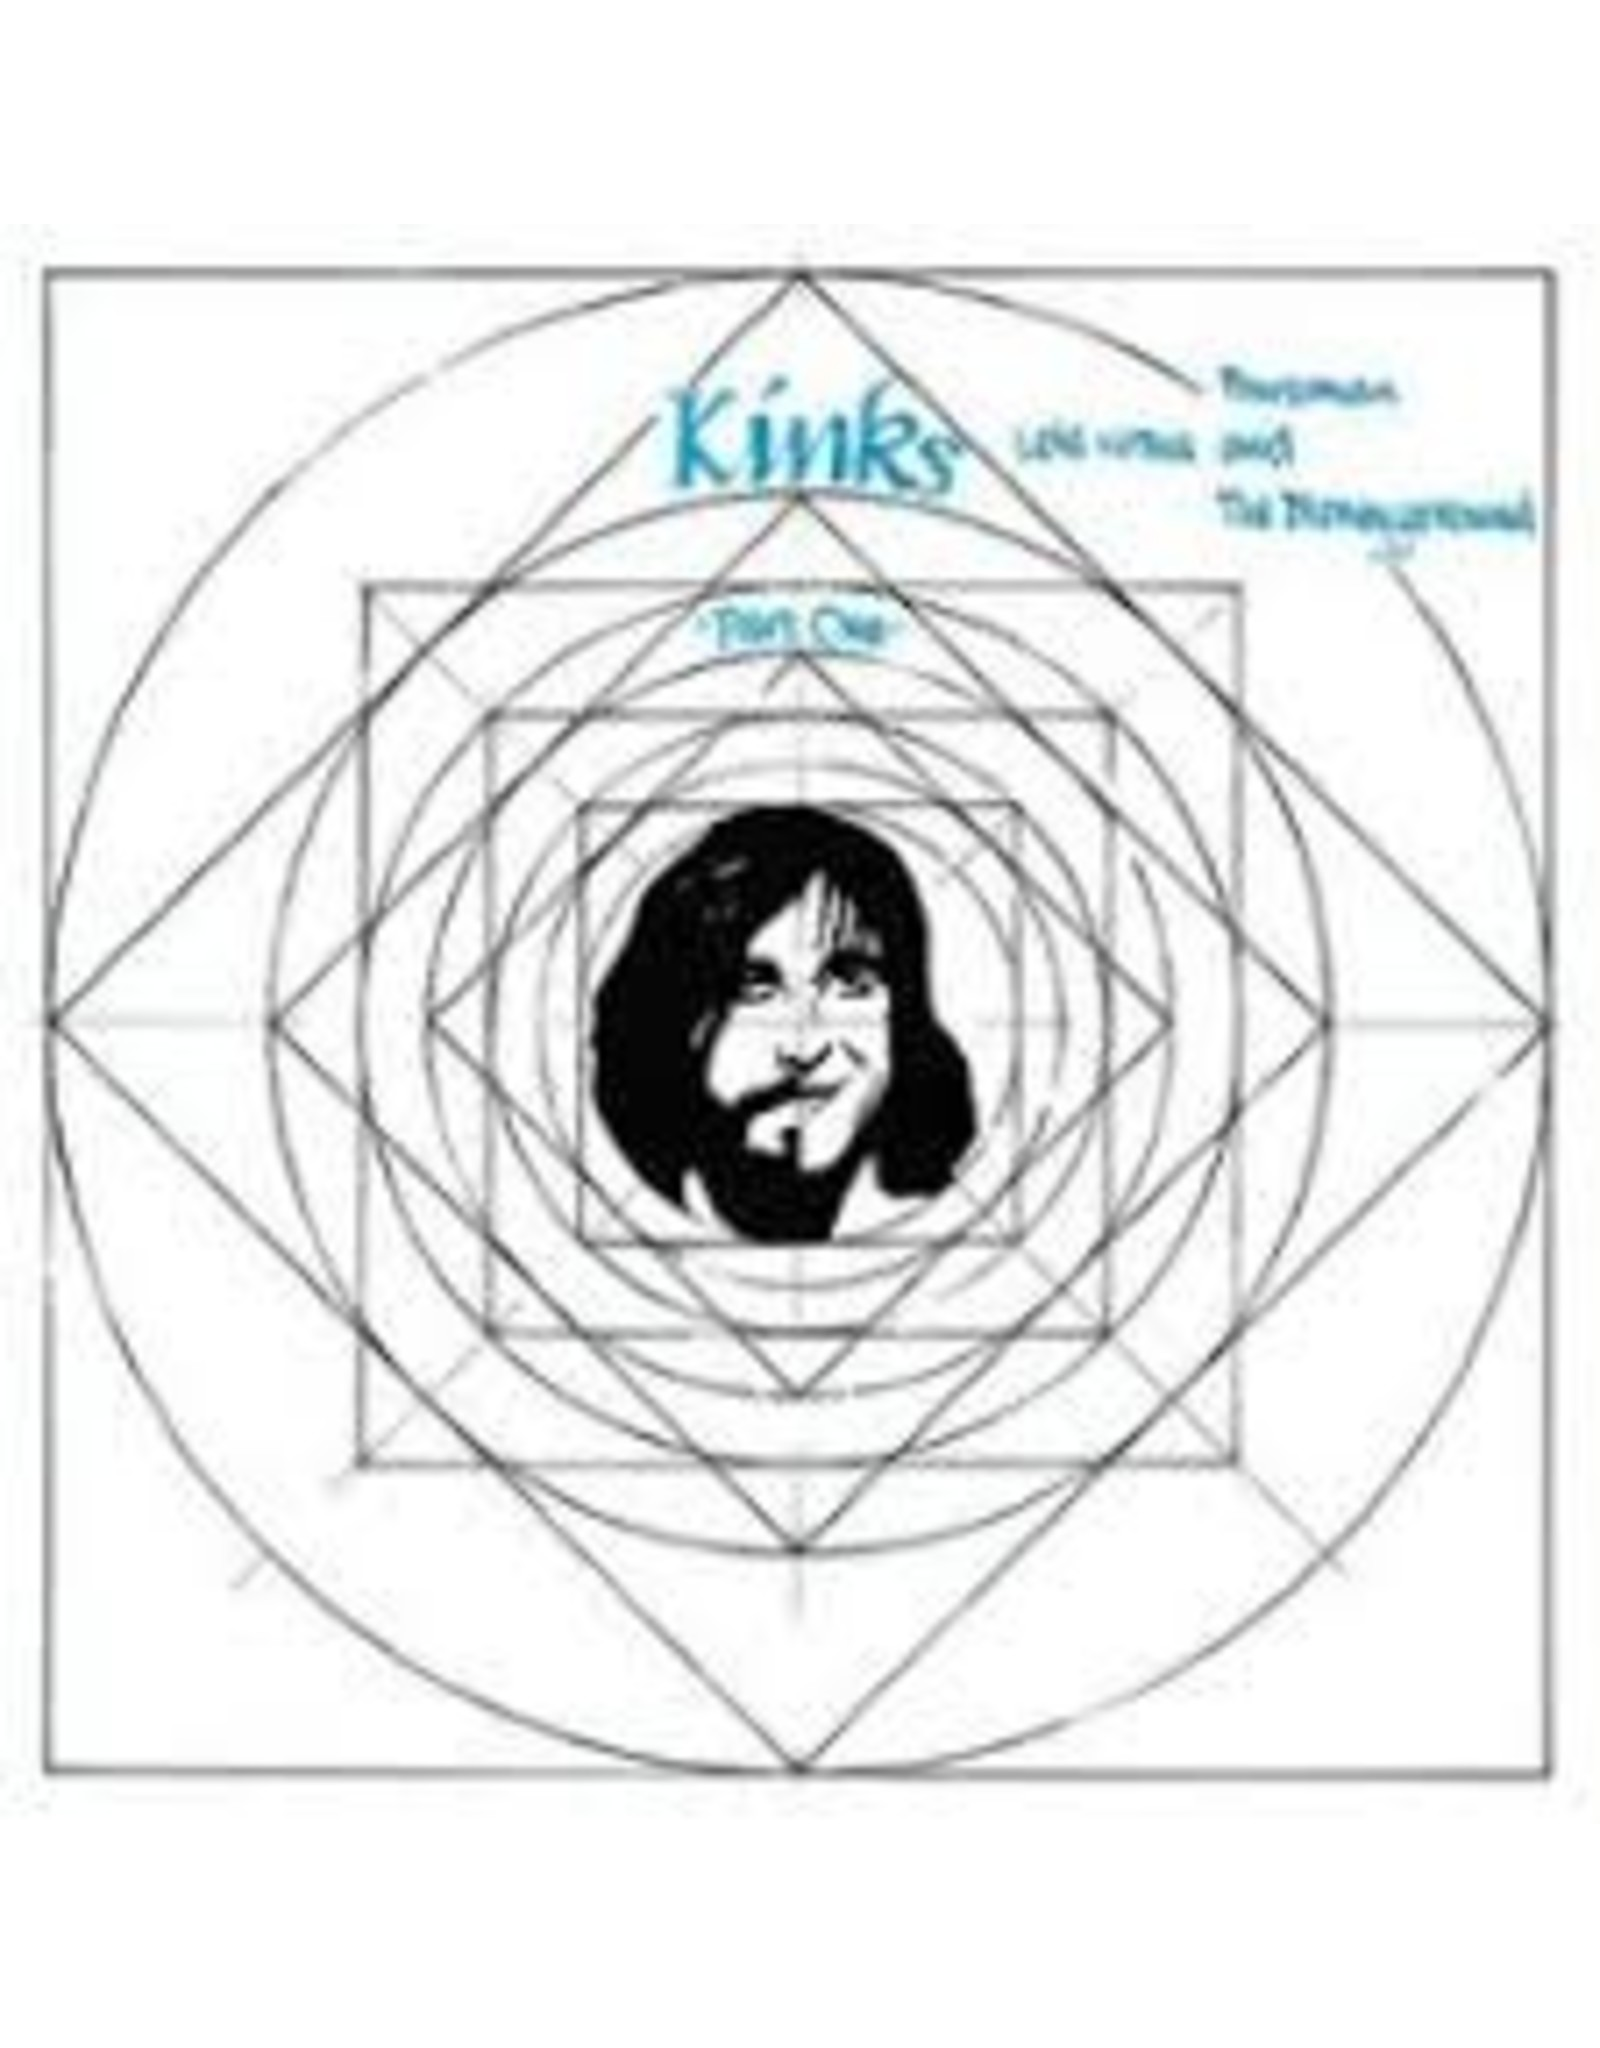 Kinks - Lola Vs The Powerman CD